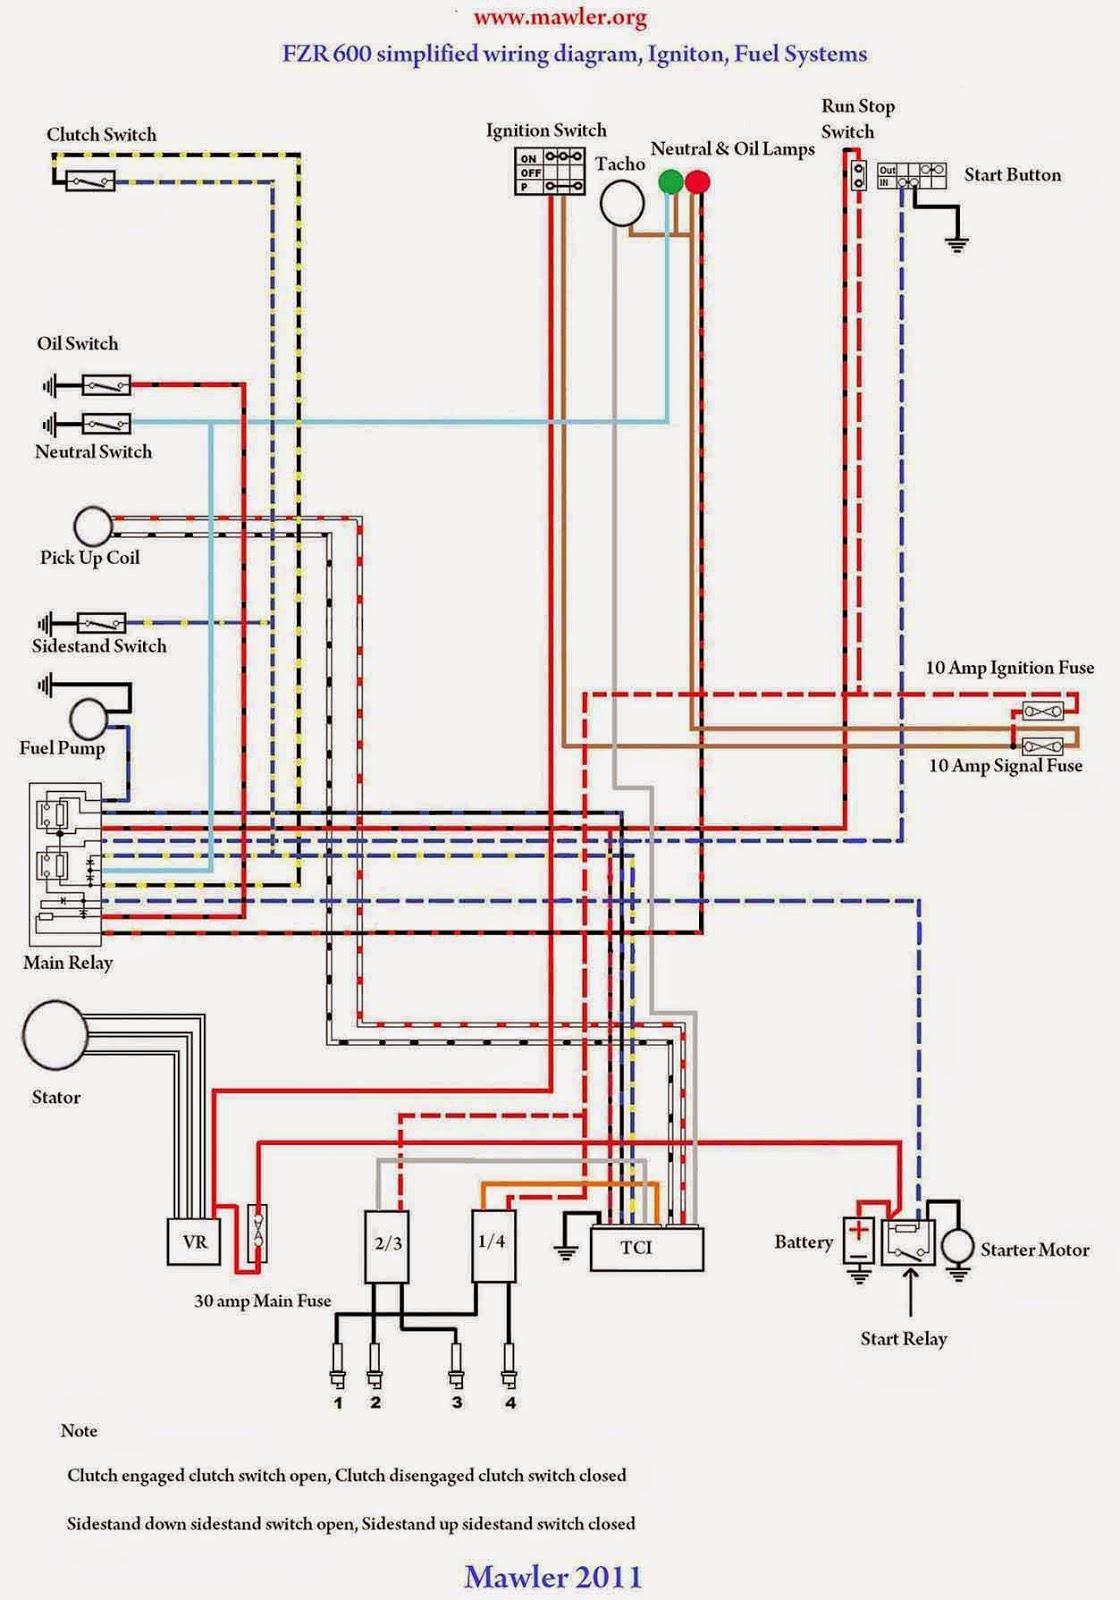 Yamaha Fzr 600 Wiring Diagram on yamaha outboard ignition wiring diagram, yamaha dt 175 wiring-diagram, yamaha r1 wiring-diagram, yamaha r6 engine diagram, yamaha 250 bear tracker wiring-diagram, 5 pin ignition switch diagram, ignition system wiring diagram, yamaha g1 fuel system diagram, yamaha road star wiring-diagram, ignition switch schematic diagram, yamaha bear tracker 250 carburetor diagram, yamaha r6 wiring-diagram, chevy ignition wiring diagram, yamaha ignition system, omc ignition switch diagram, ignition starter switch diagram, harley ignition switch diagram, yamaha grizzly 660 wiring-diagram, yamaha rhino electrical diagram, yamaha rhino ignition wiring diagram,